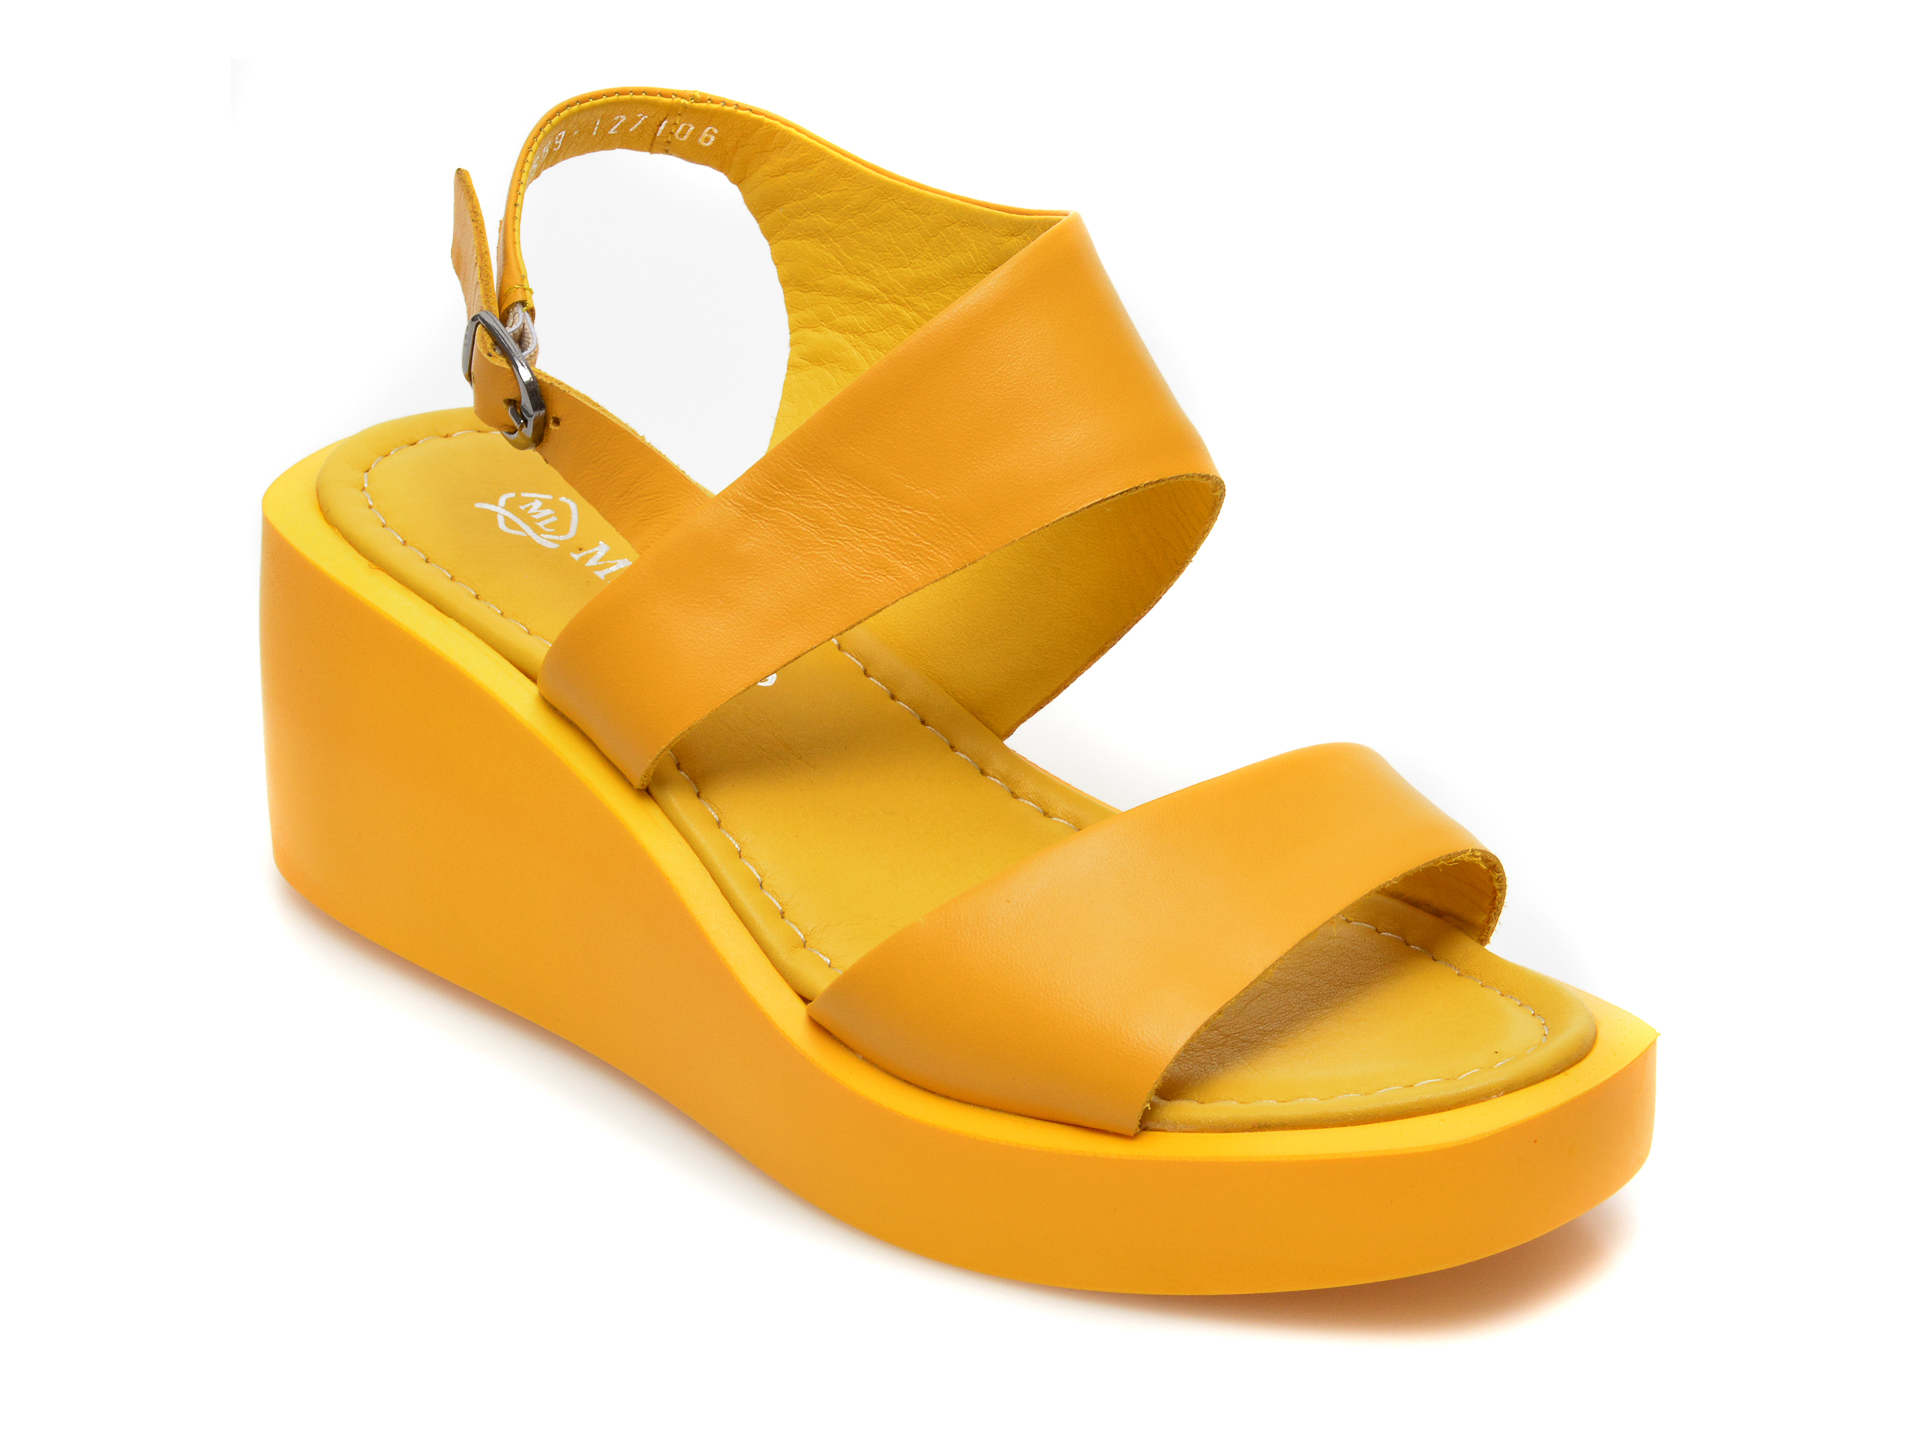 Sandale MISS LIZA galbene, 2689, din piele naturala imagine 2021 Miss Liza